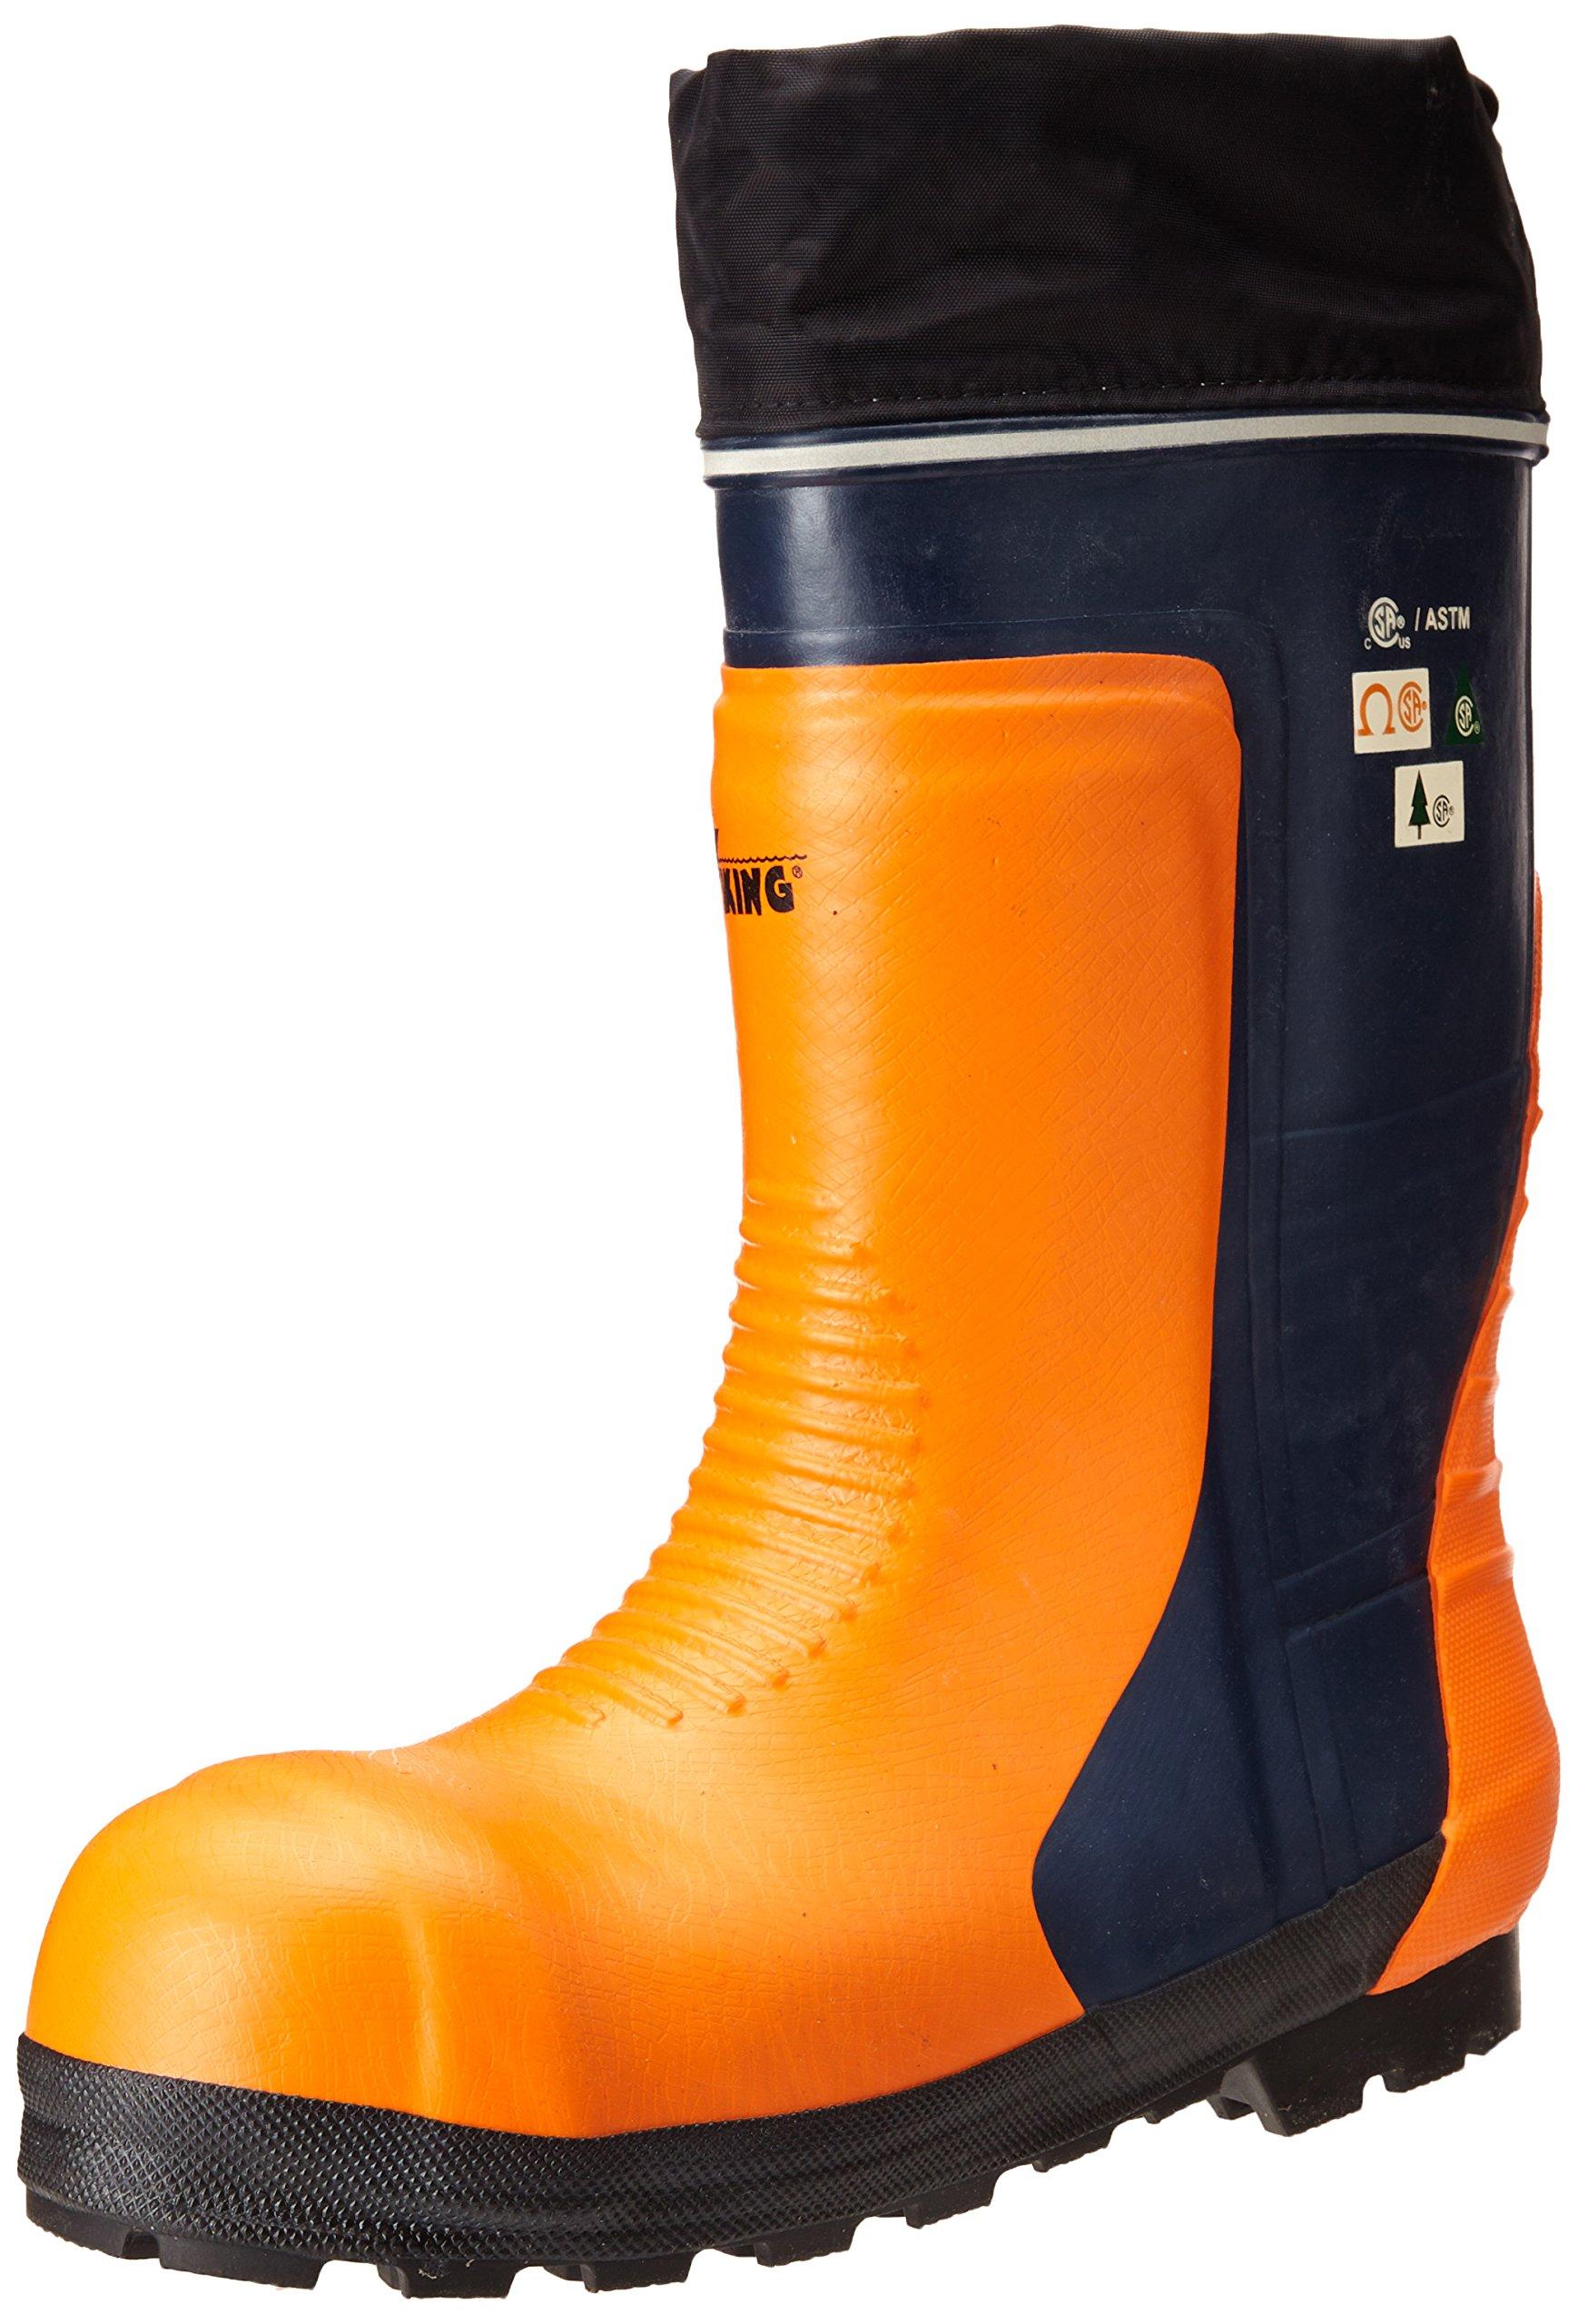 Viking Footwear Bushwhacker Waterproof Steel Toe Winter Boot, Black/Orange, 12 M US